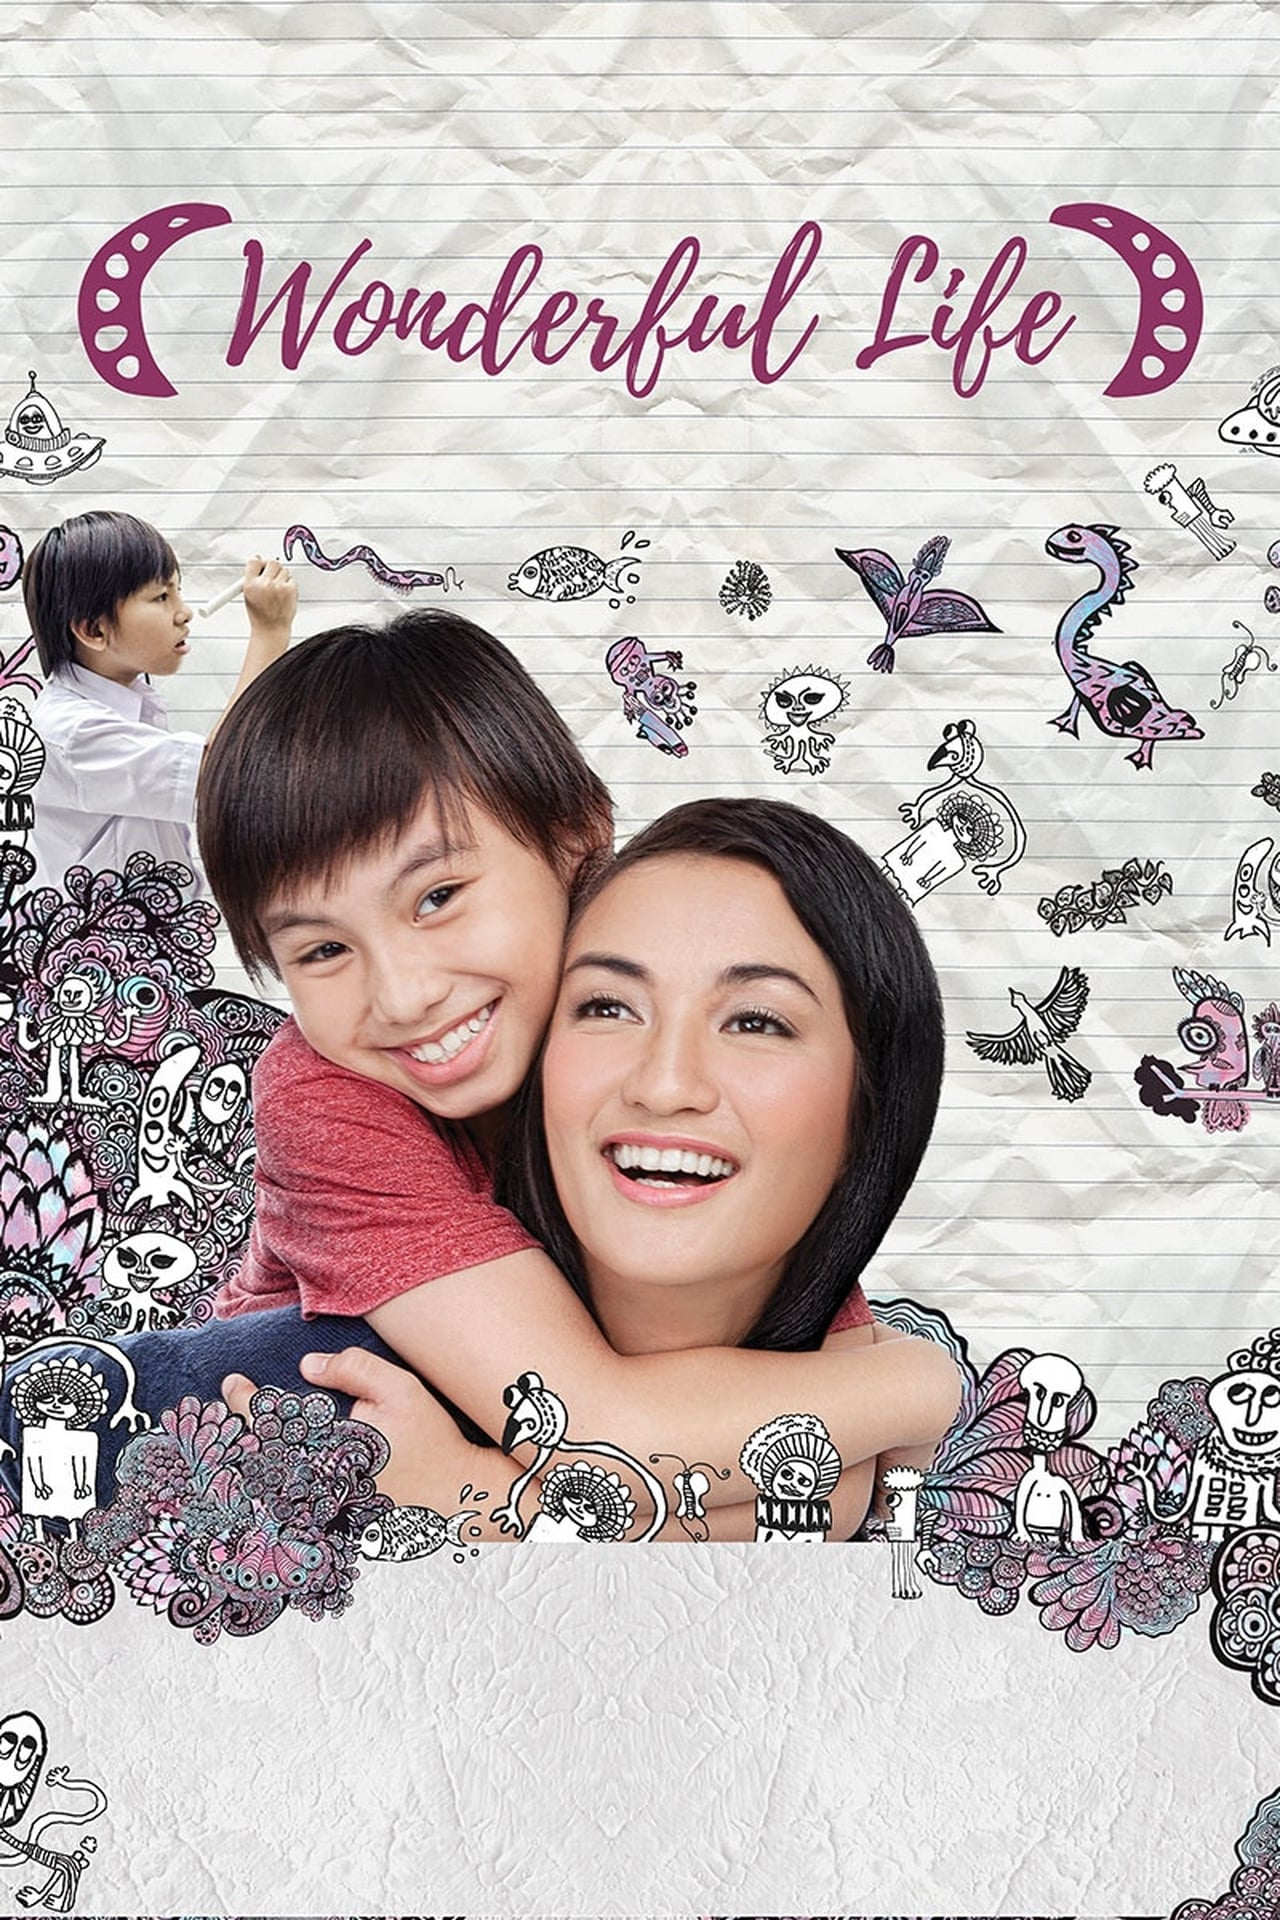 Wonderful Life